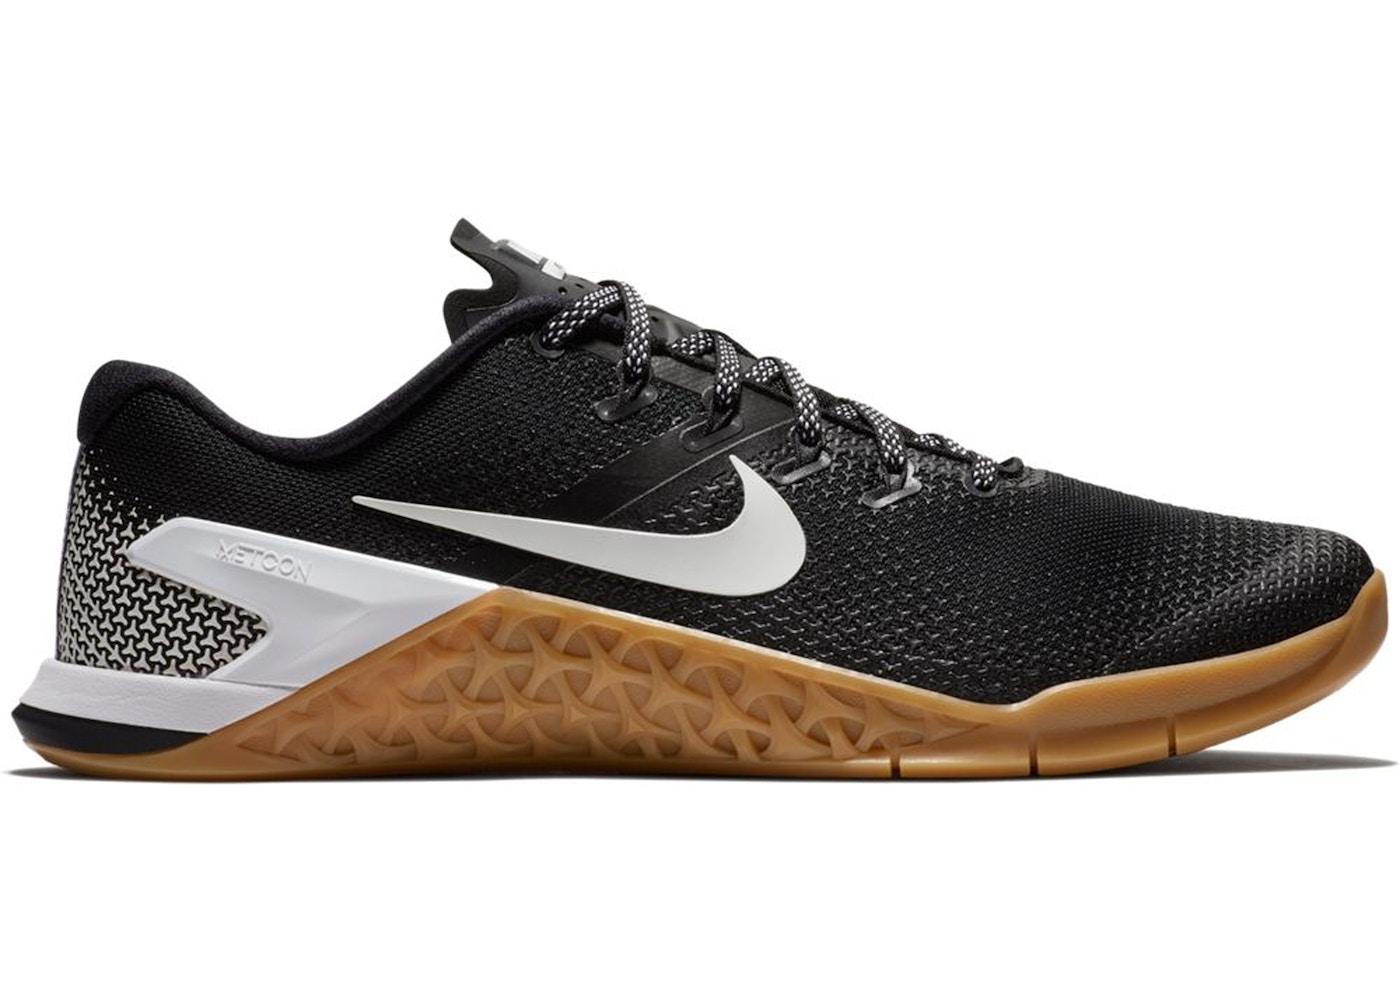 Sobriqueta Respecto a tierra  Nike Metcon 4 Black White Gum - AH7453-006